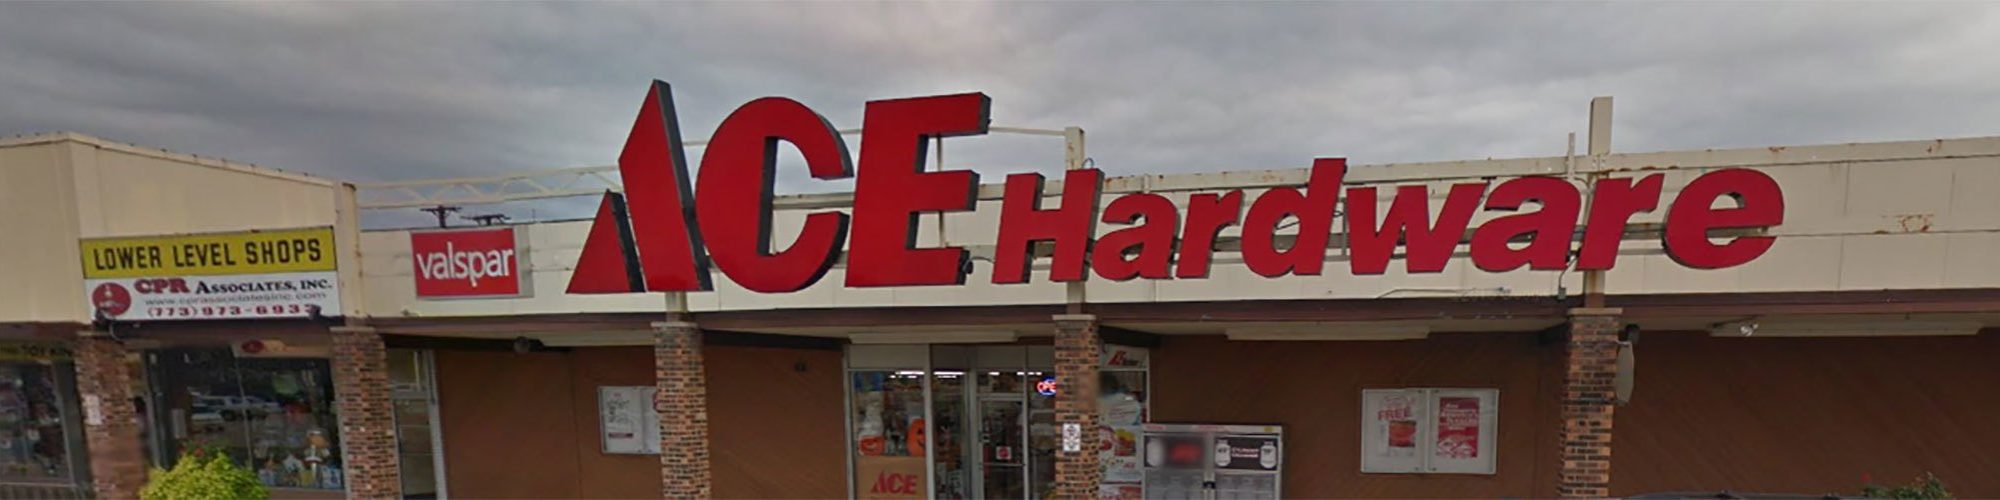 Gordon S Ace Hardware Ace Hardware In Chicago